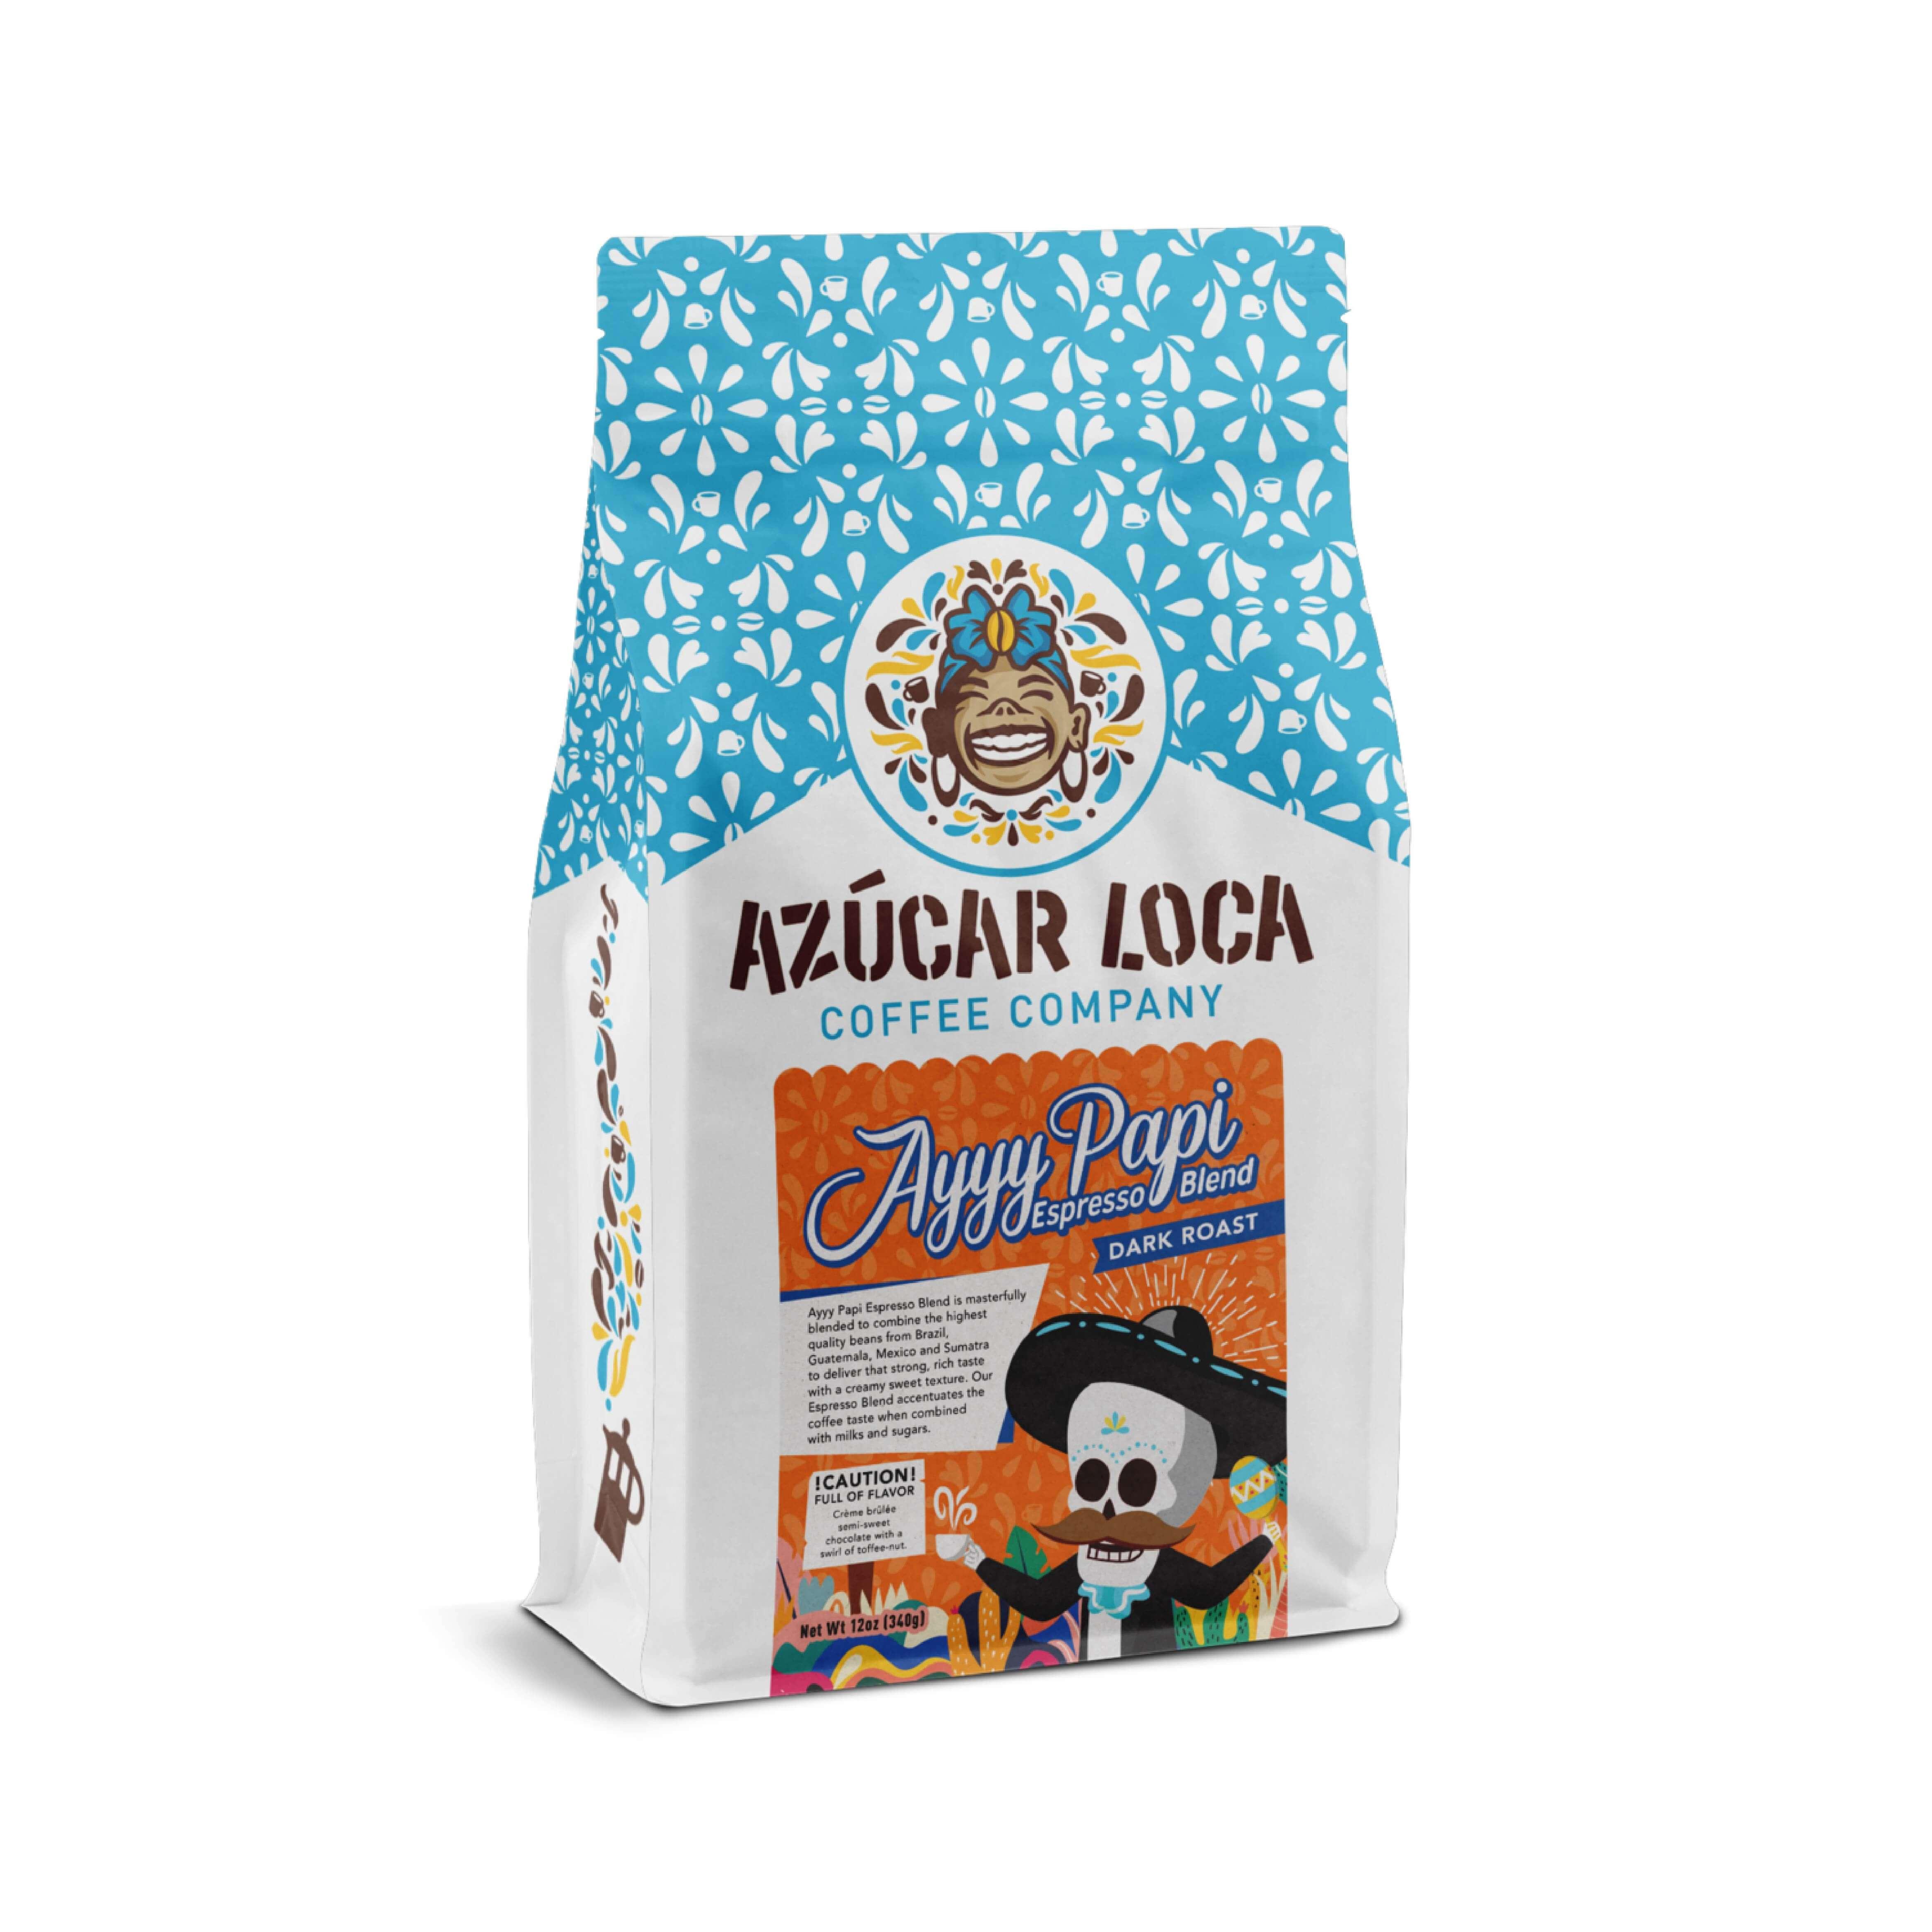 Ayyy Papi Espresso Blend from Azucar Loca Coffee Company